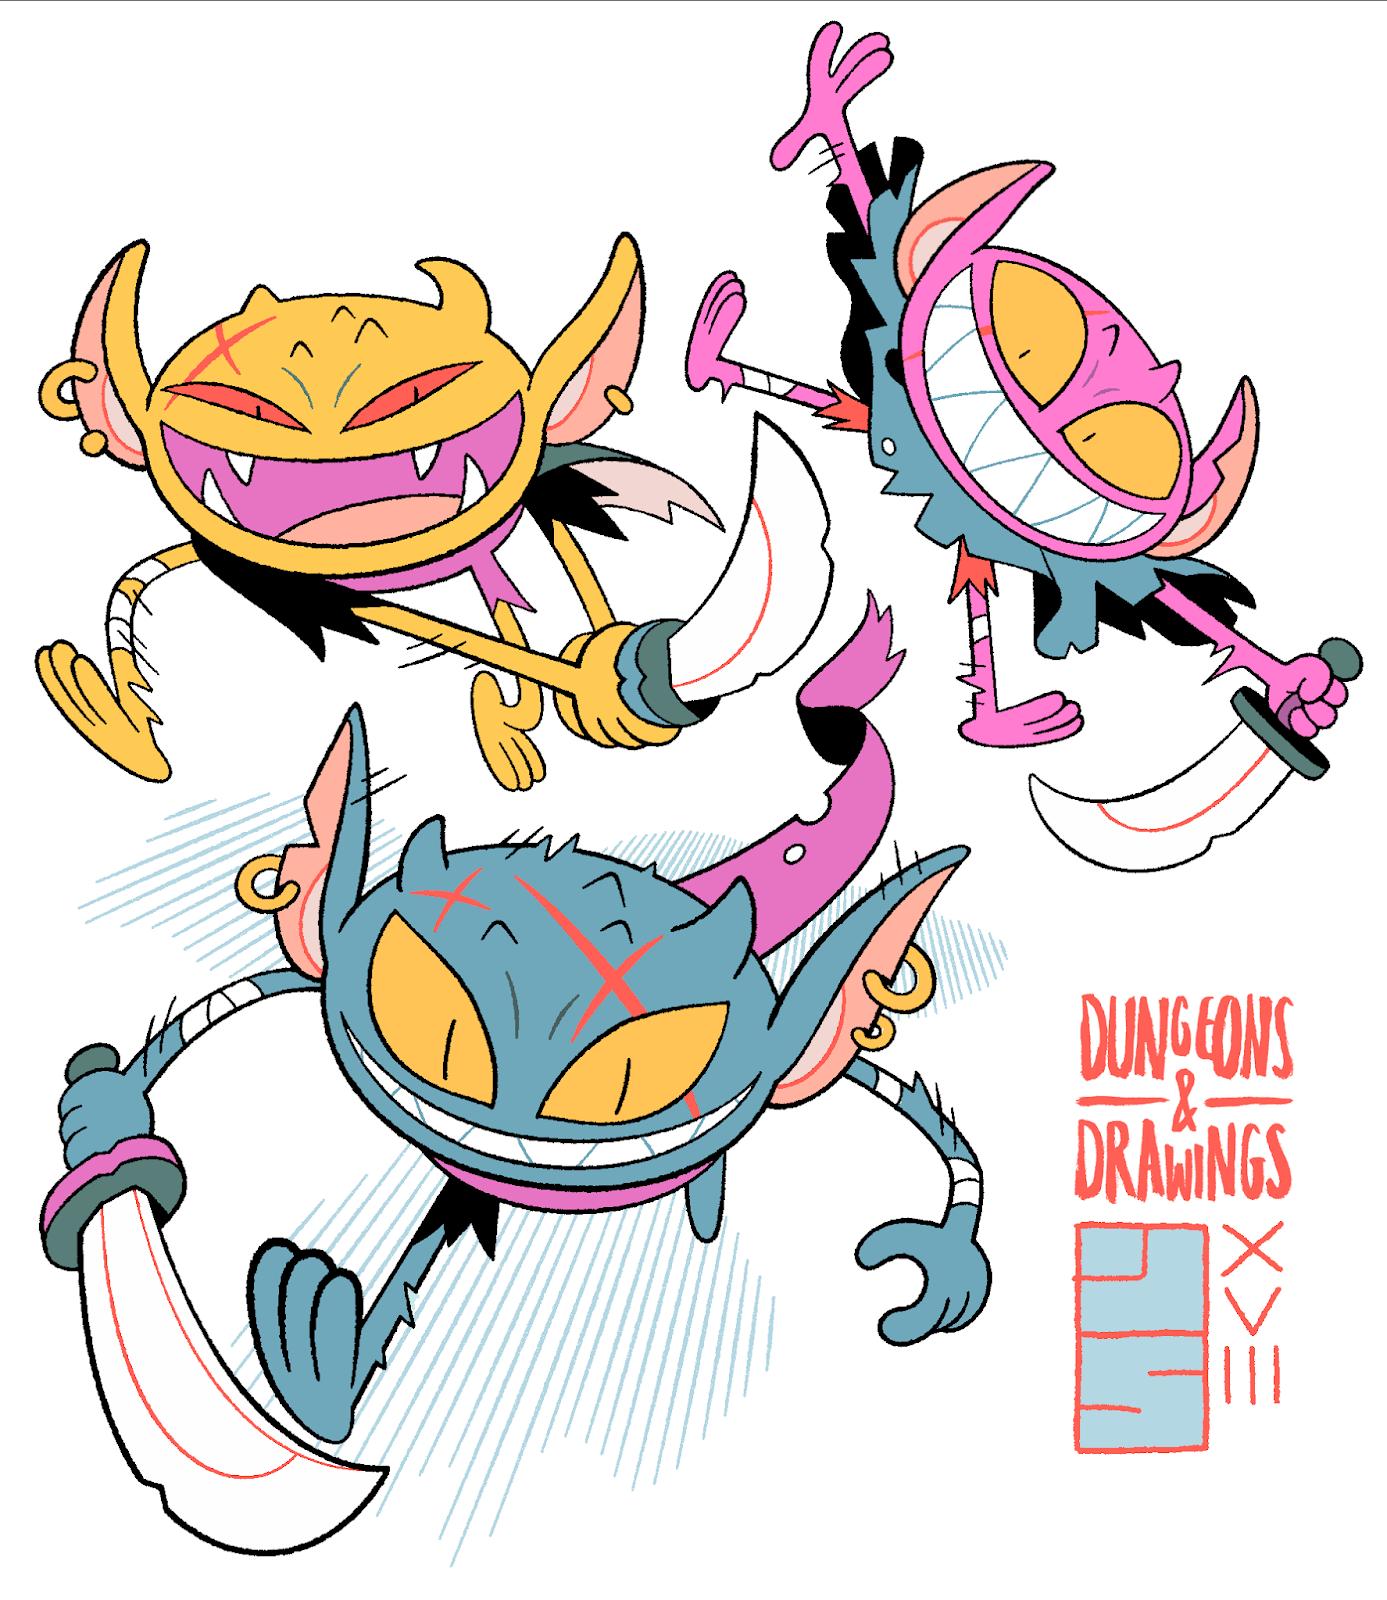 "dungeonsanddrawings """" - by Joe Sparrow dungeonsanddrawings.blogspot.com (2018-12) © dell'autore tutti i diritti riservati"